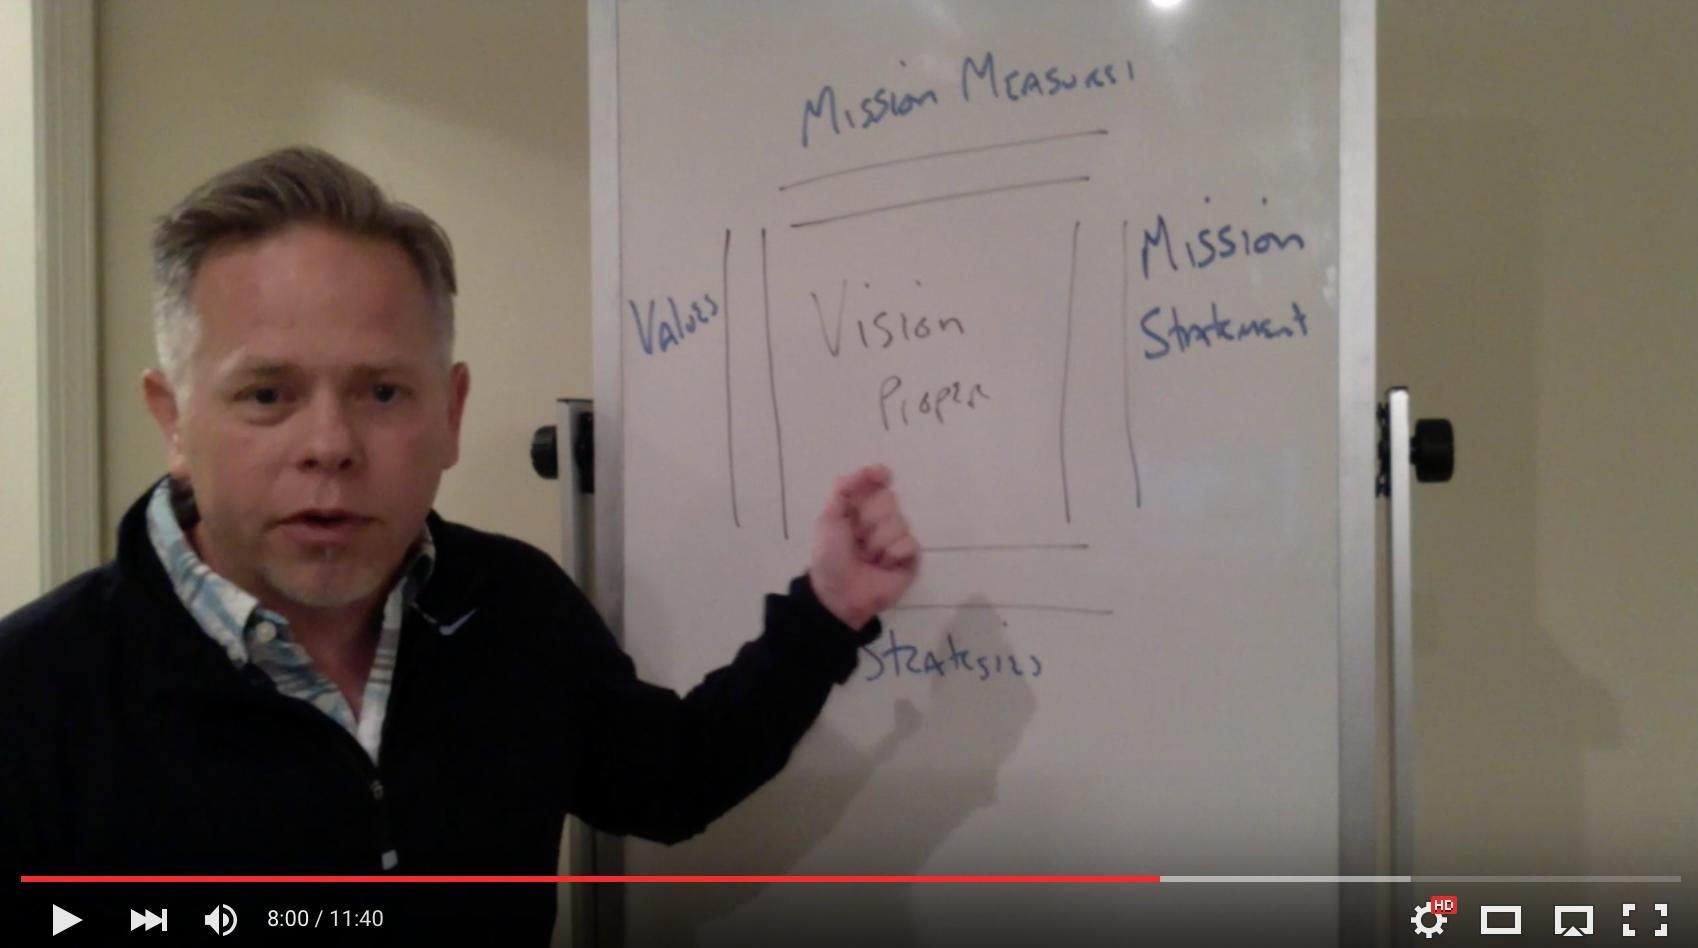 The Vision Frame